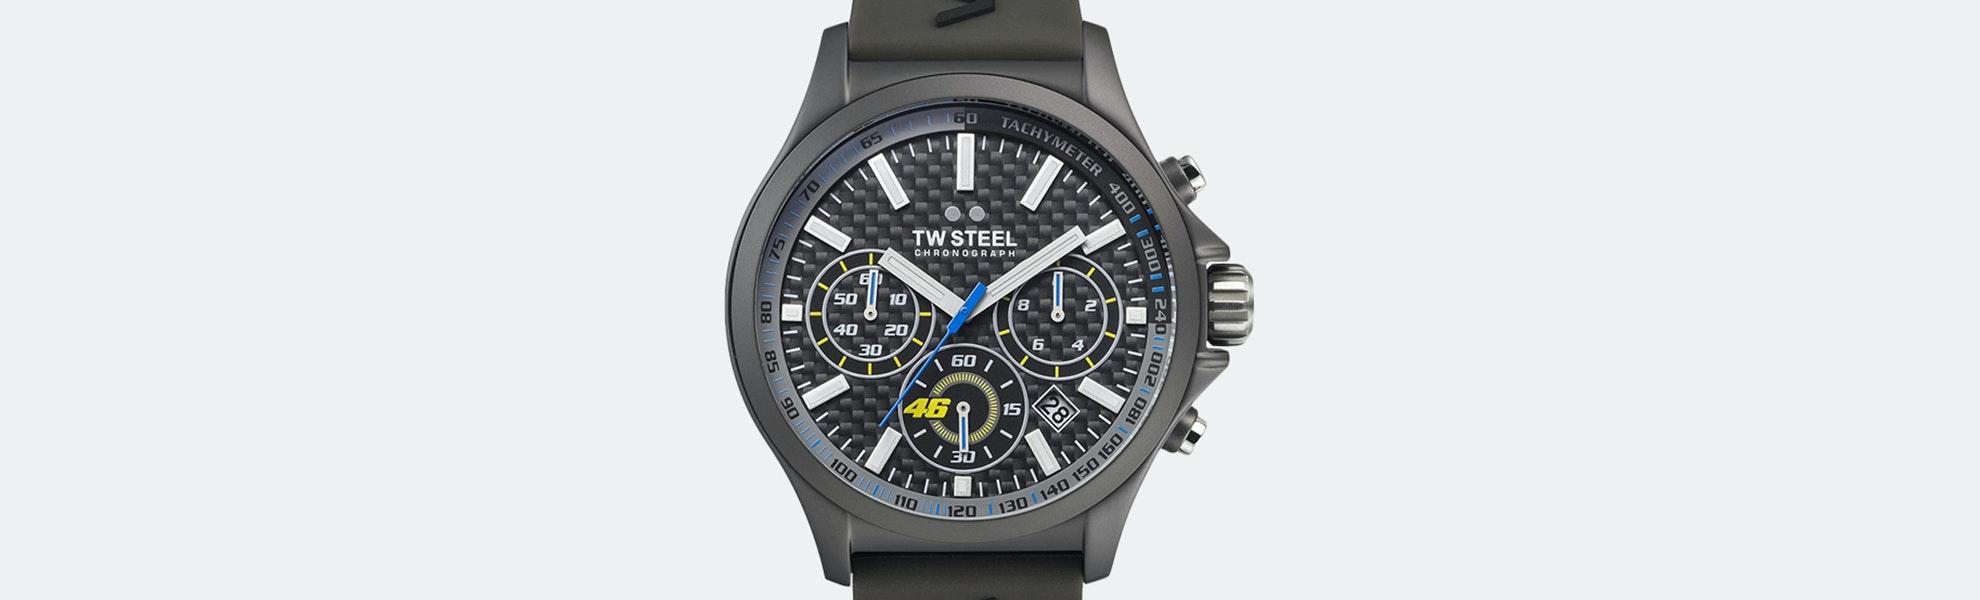 TW Steel VR46 Pilot Quartz Watch